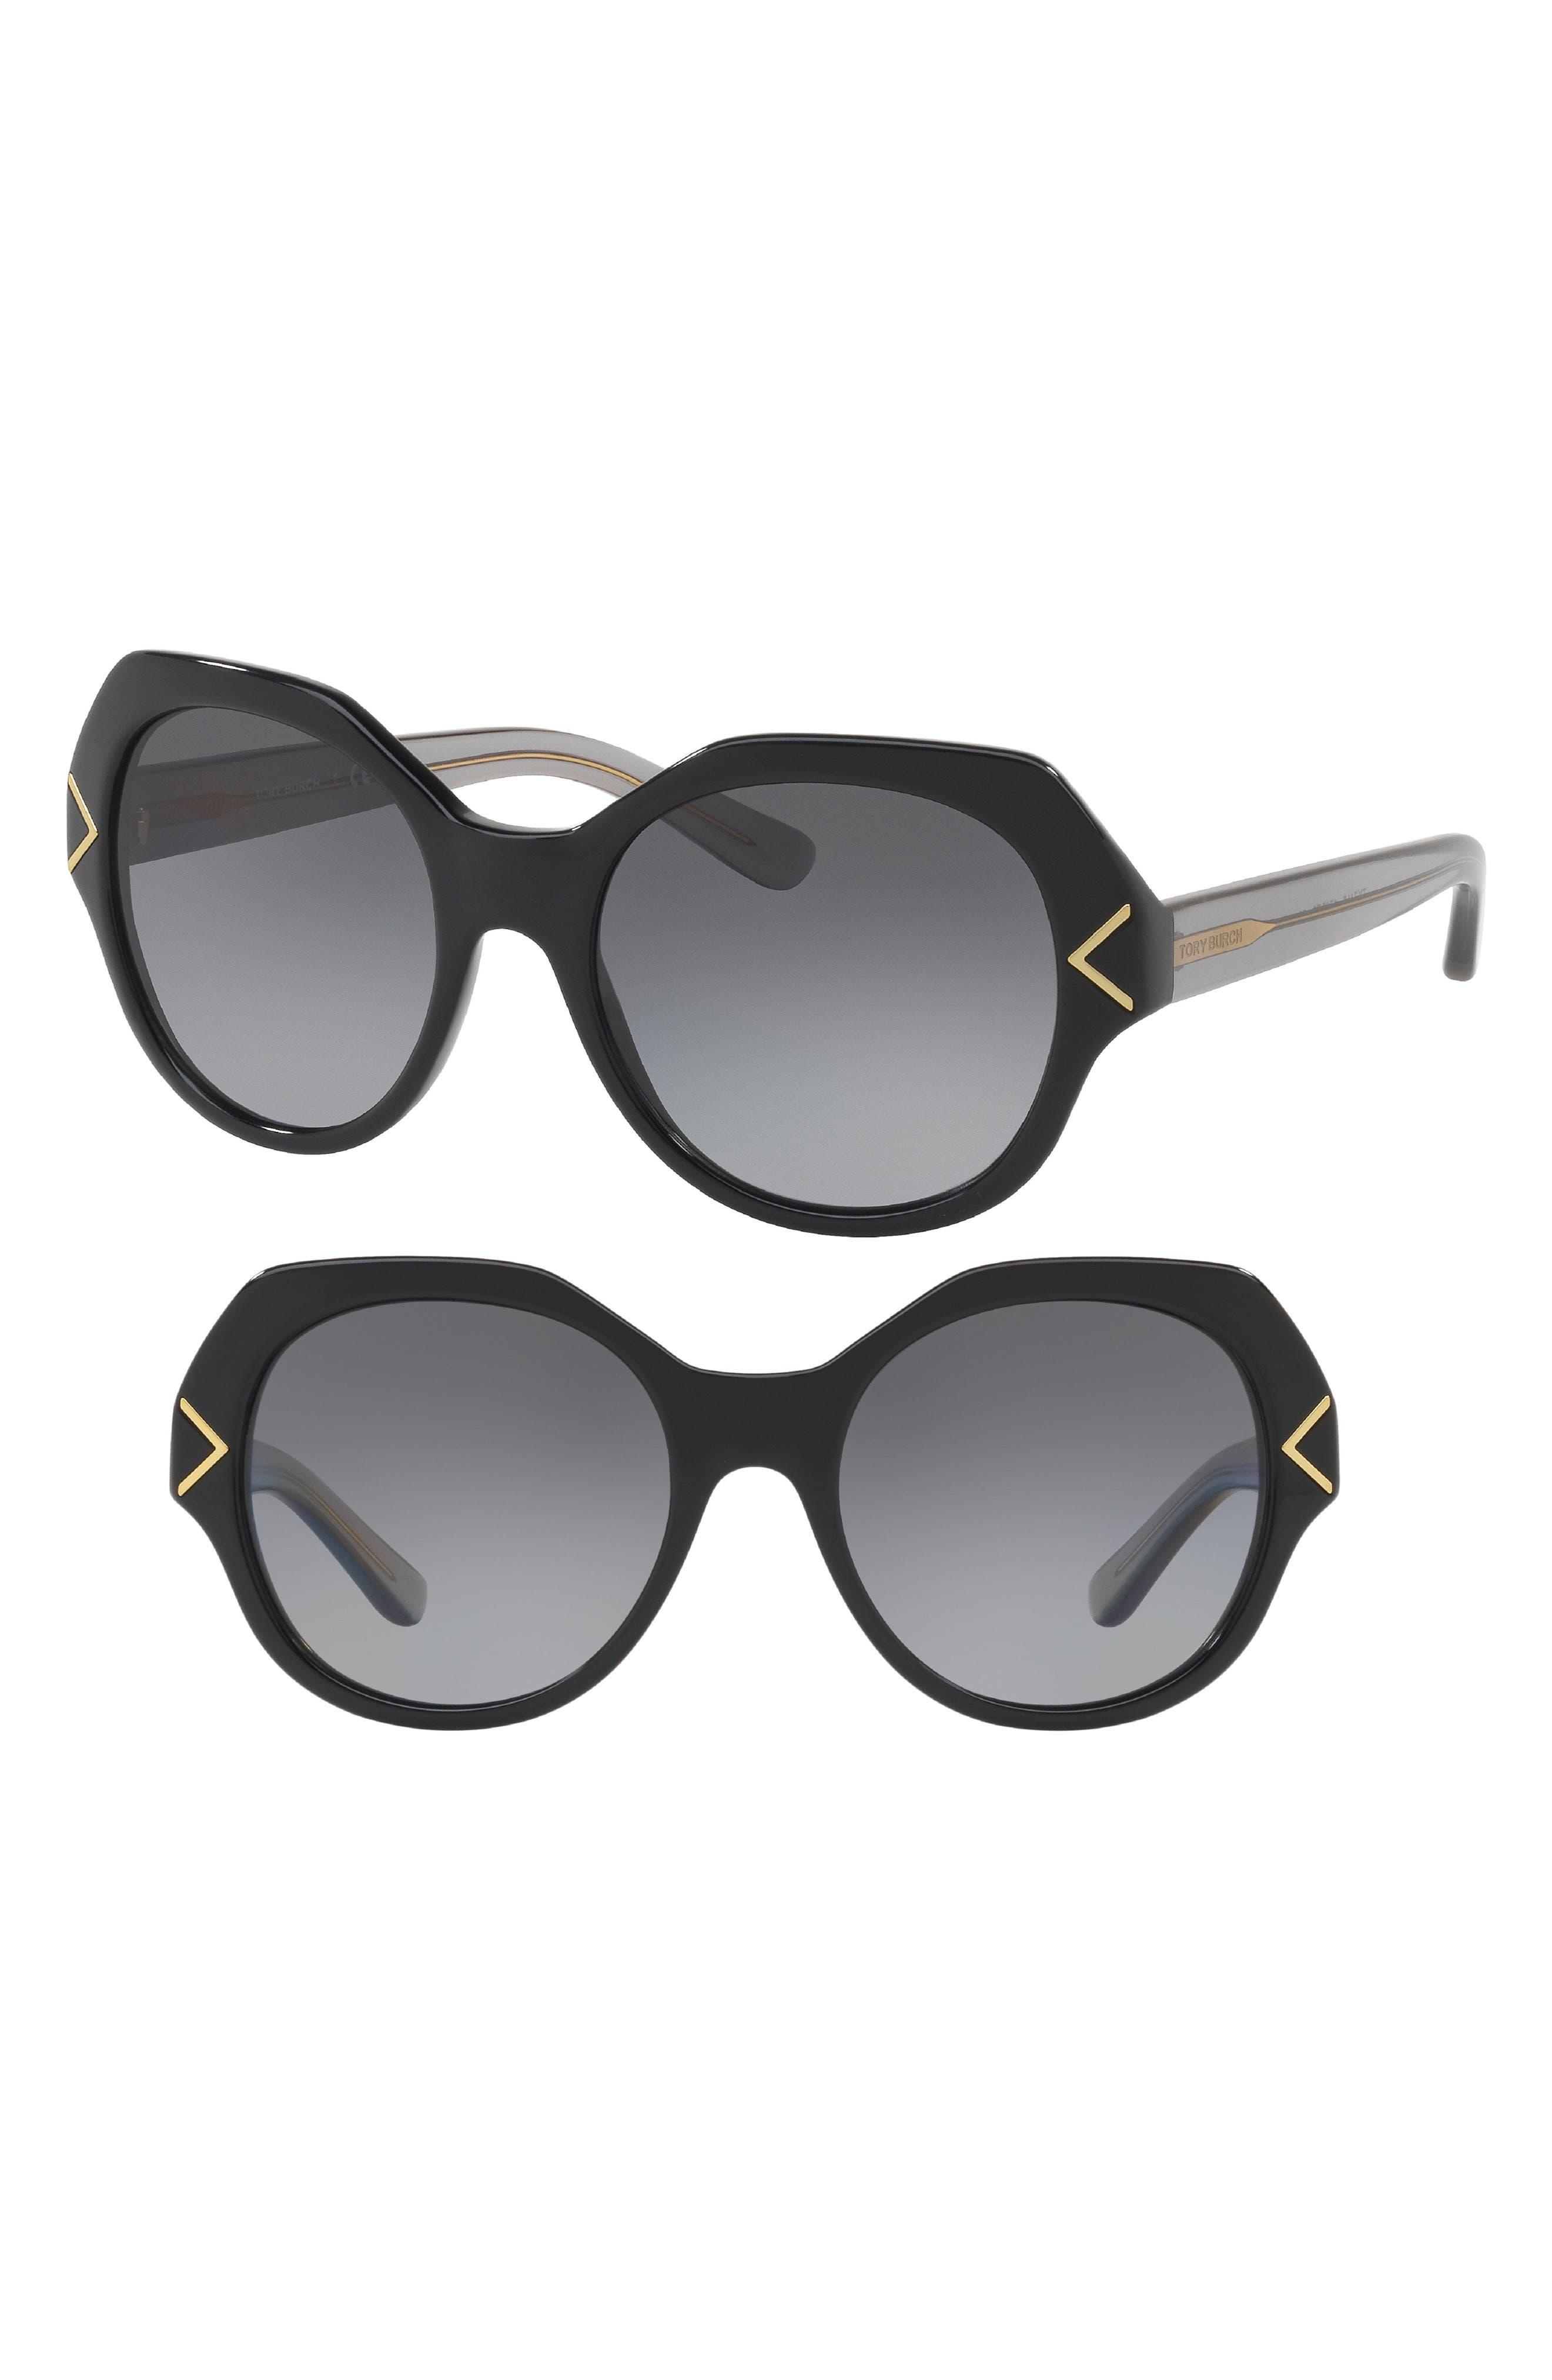 53mm Polarized Gradient Geometric Sunglasses,                         Main,                         color, Black/ Silver